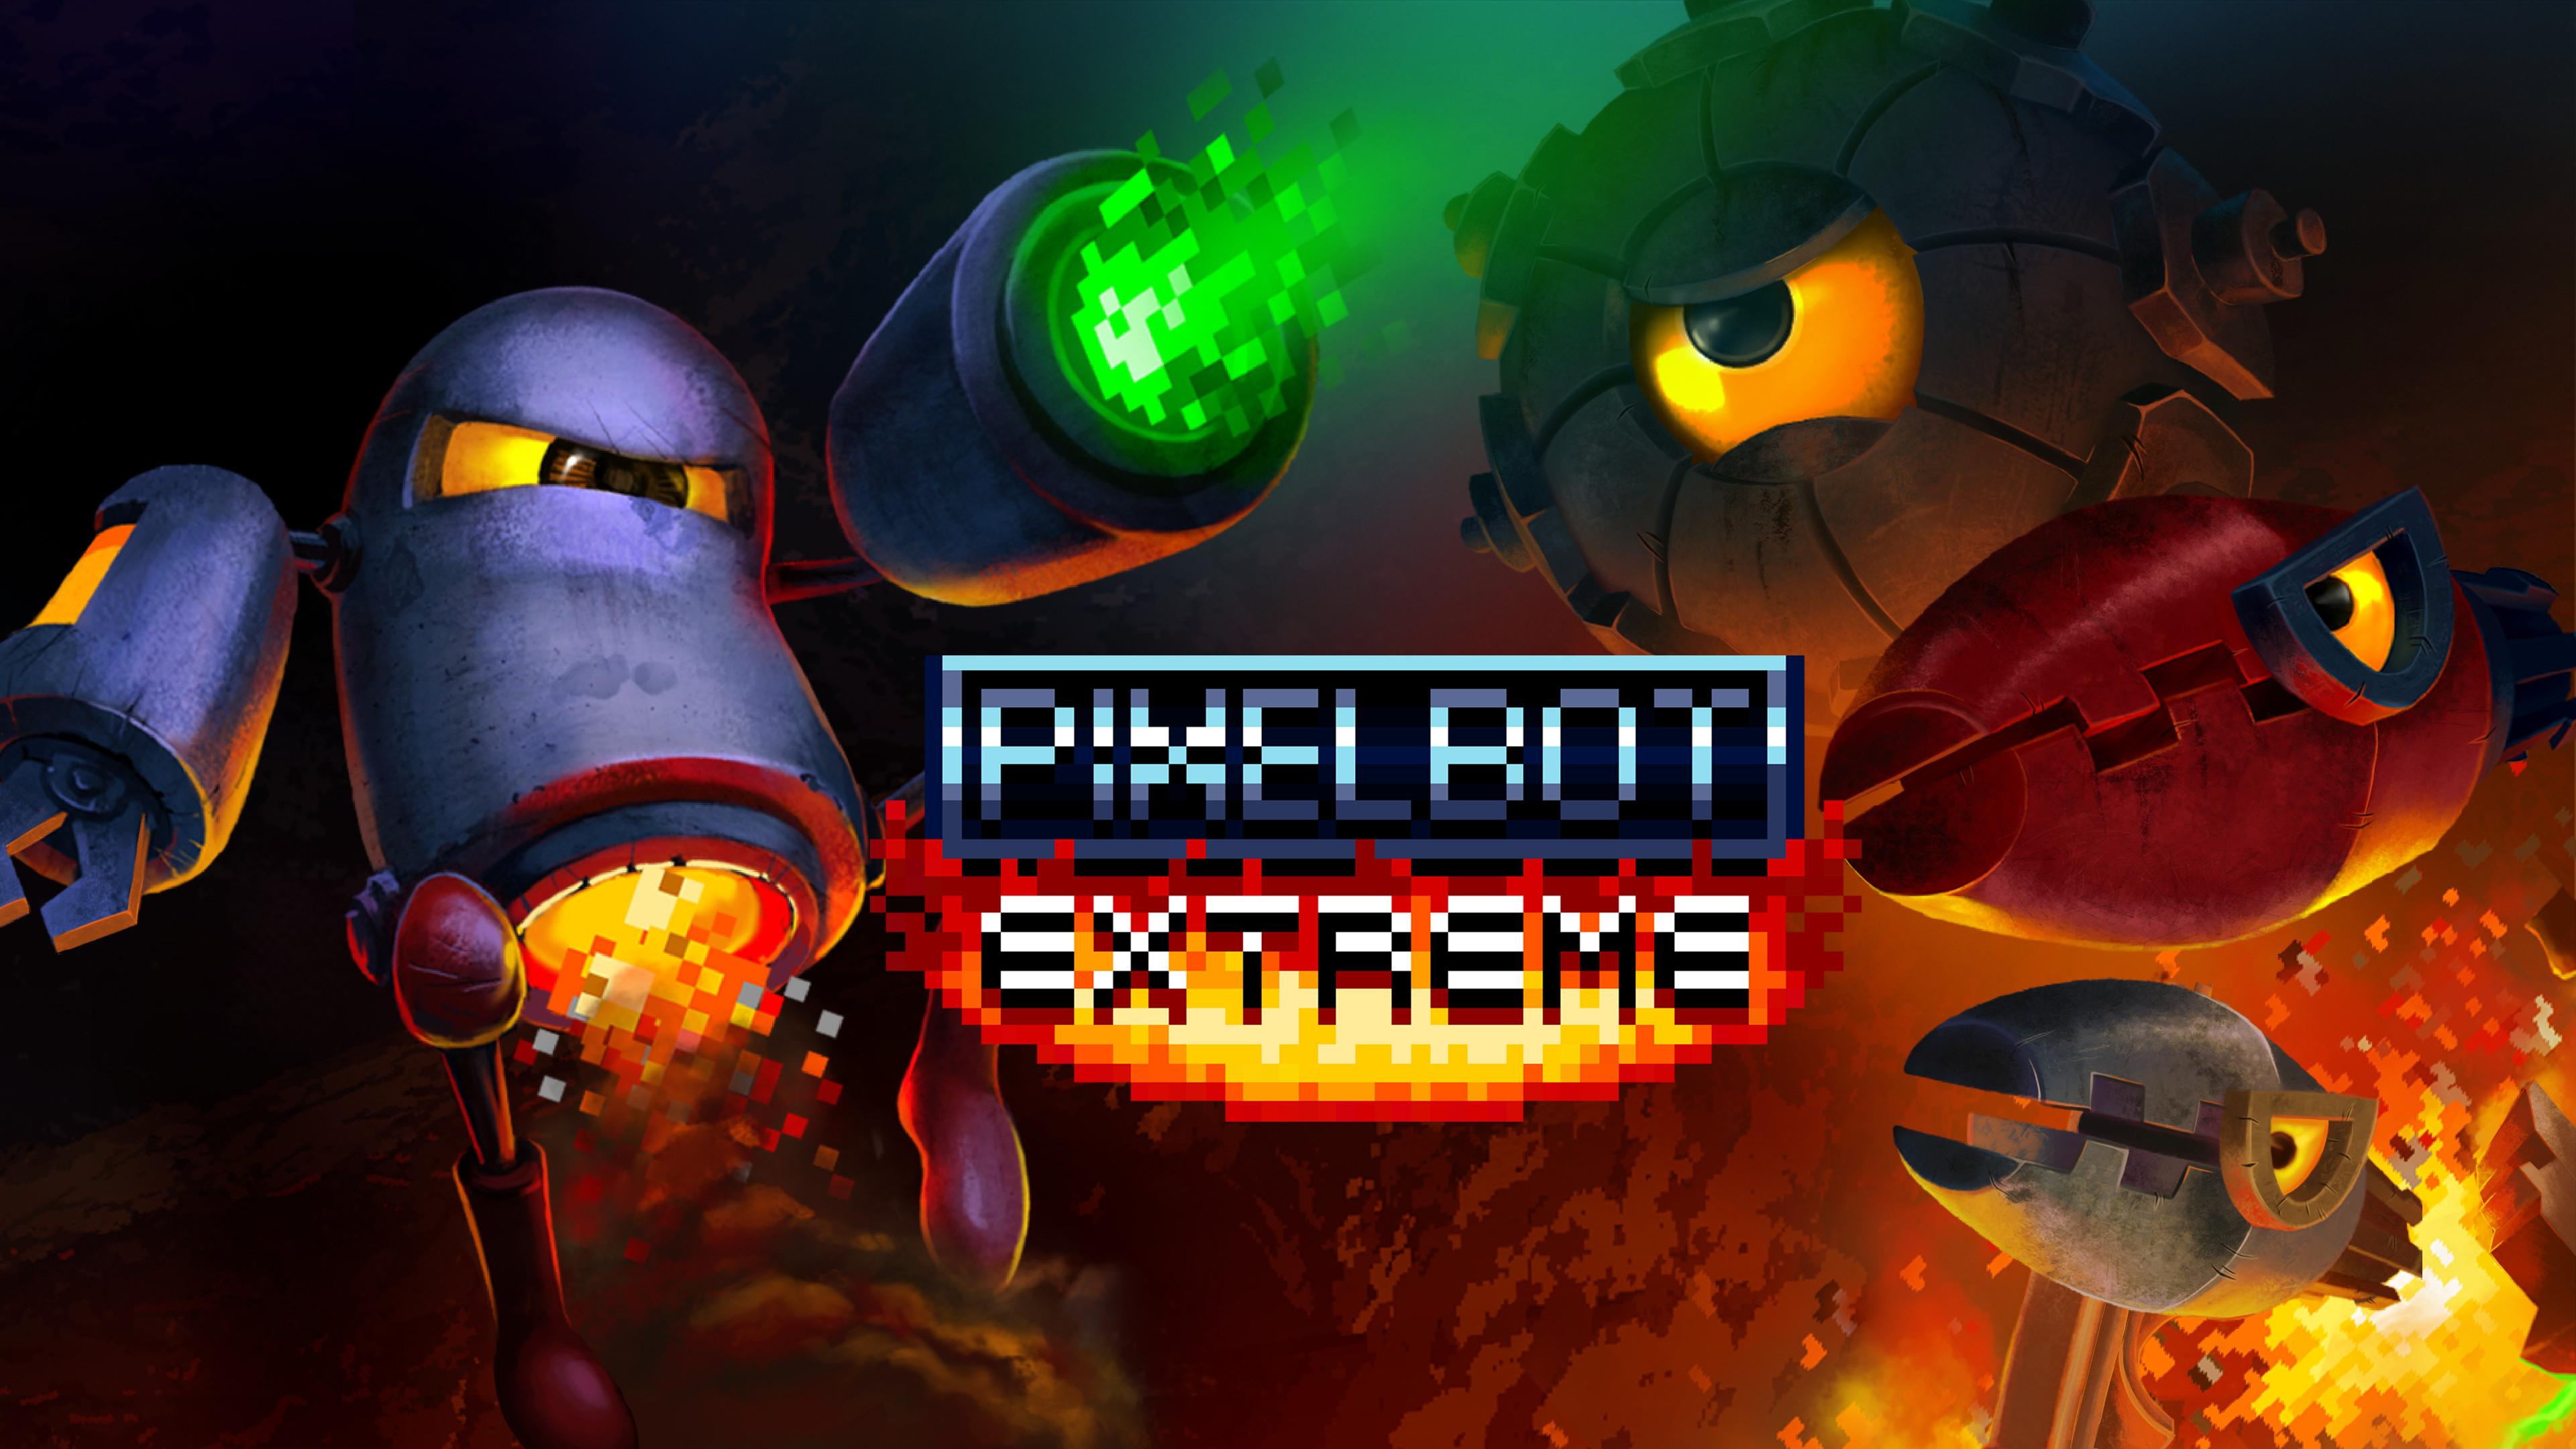 Pixelbot Title